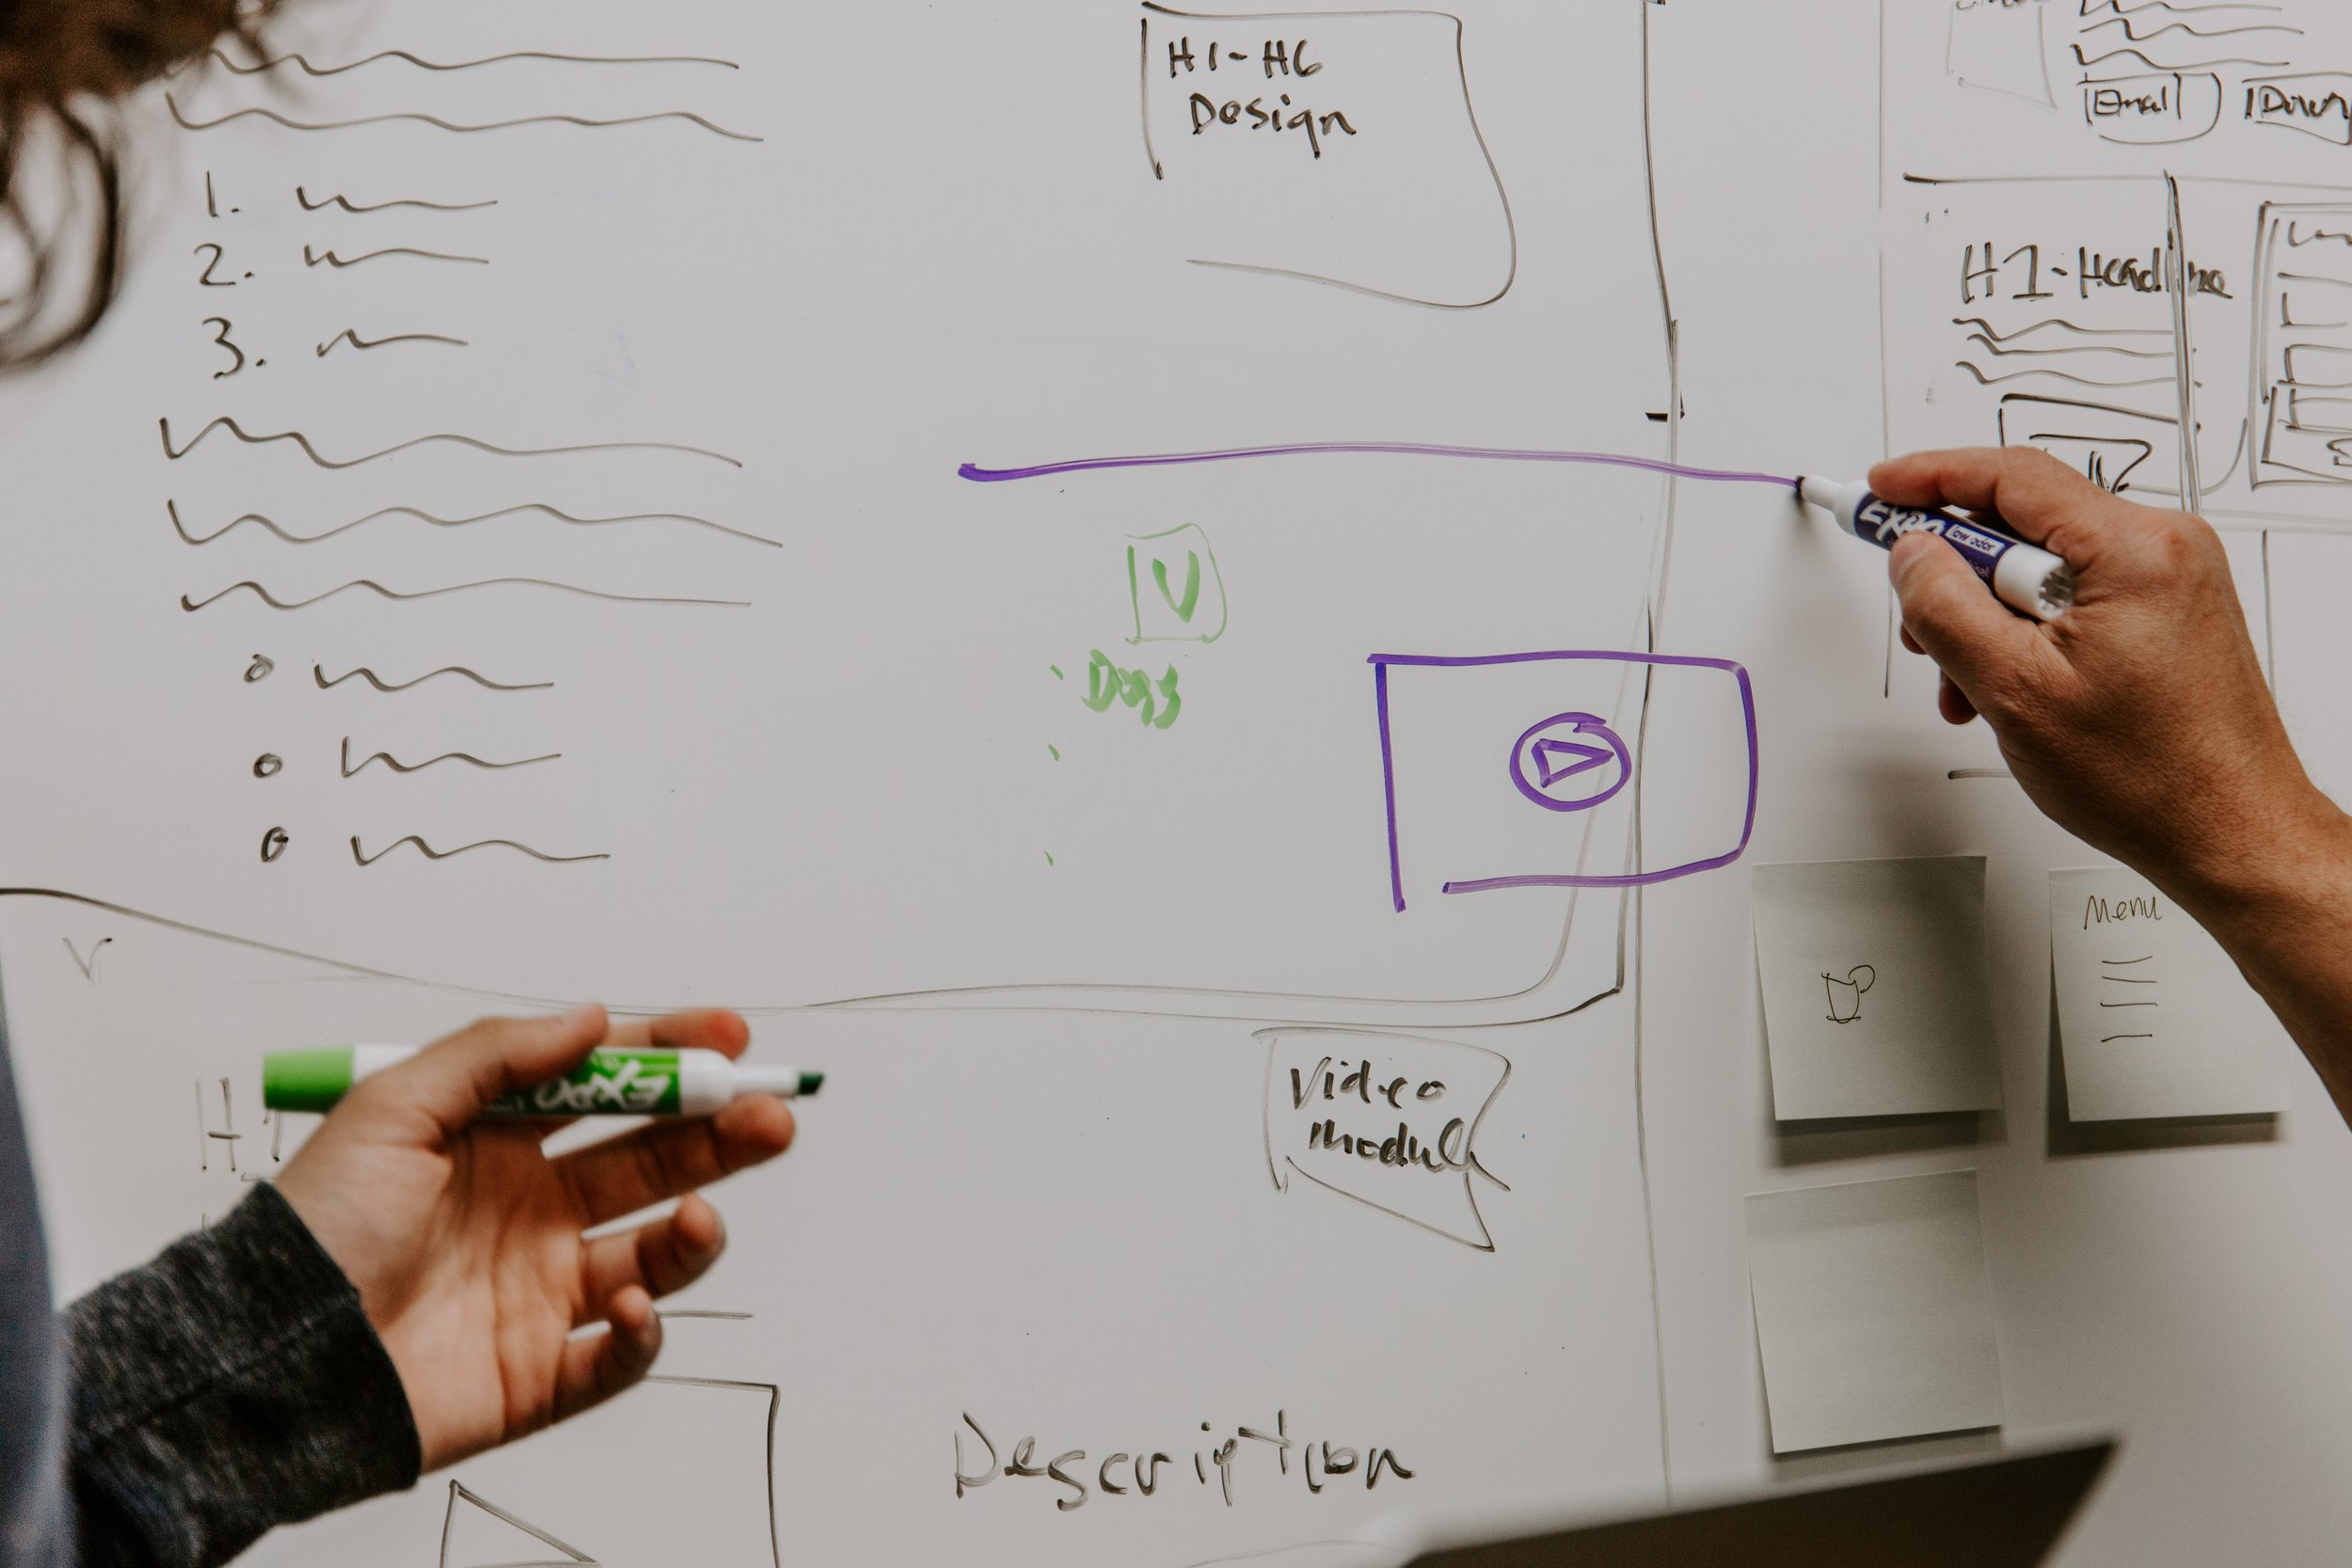 two-people-brainstorming-ideas-whiteboard